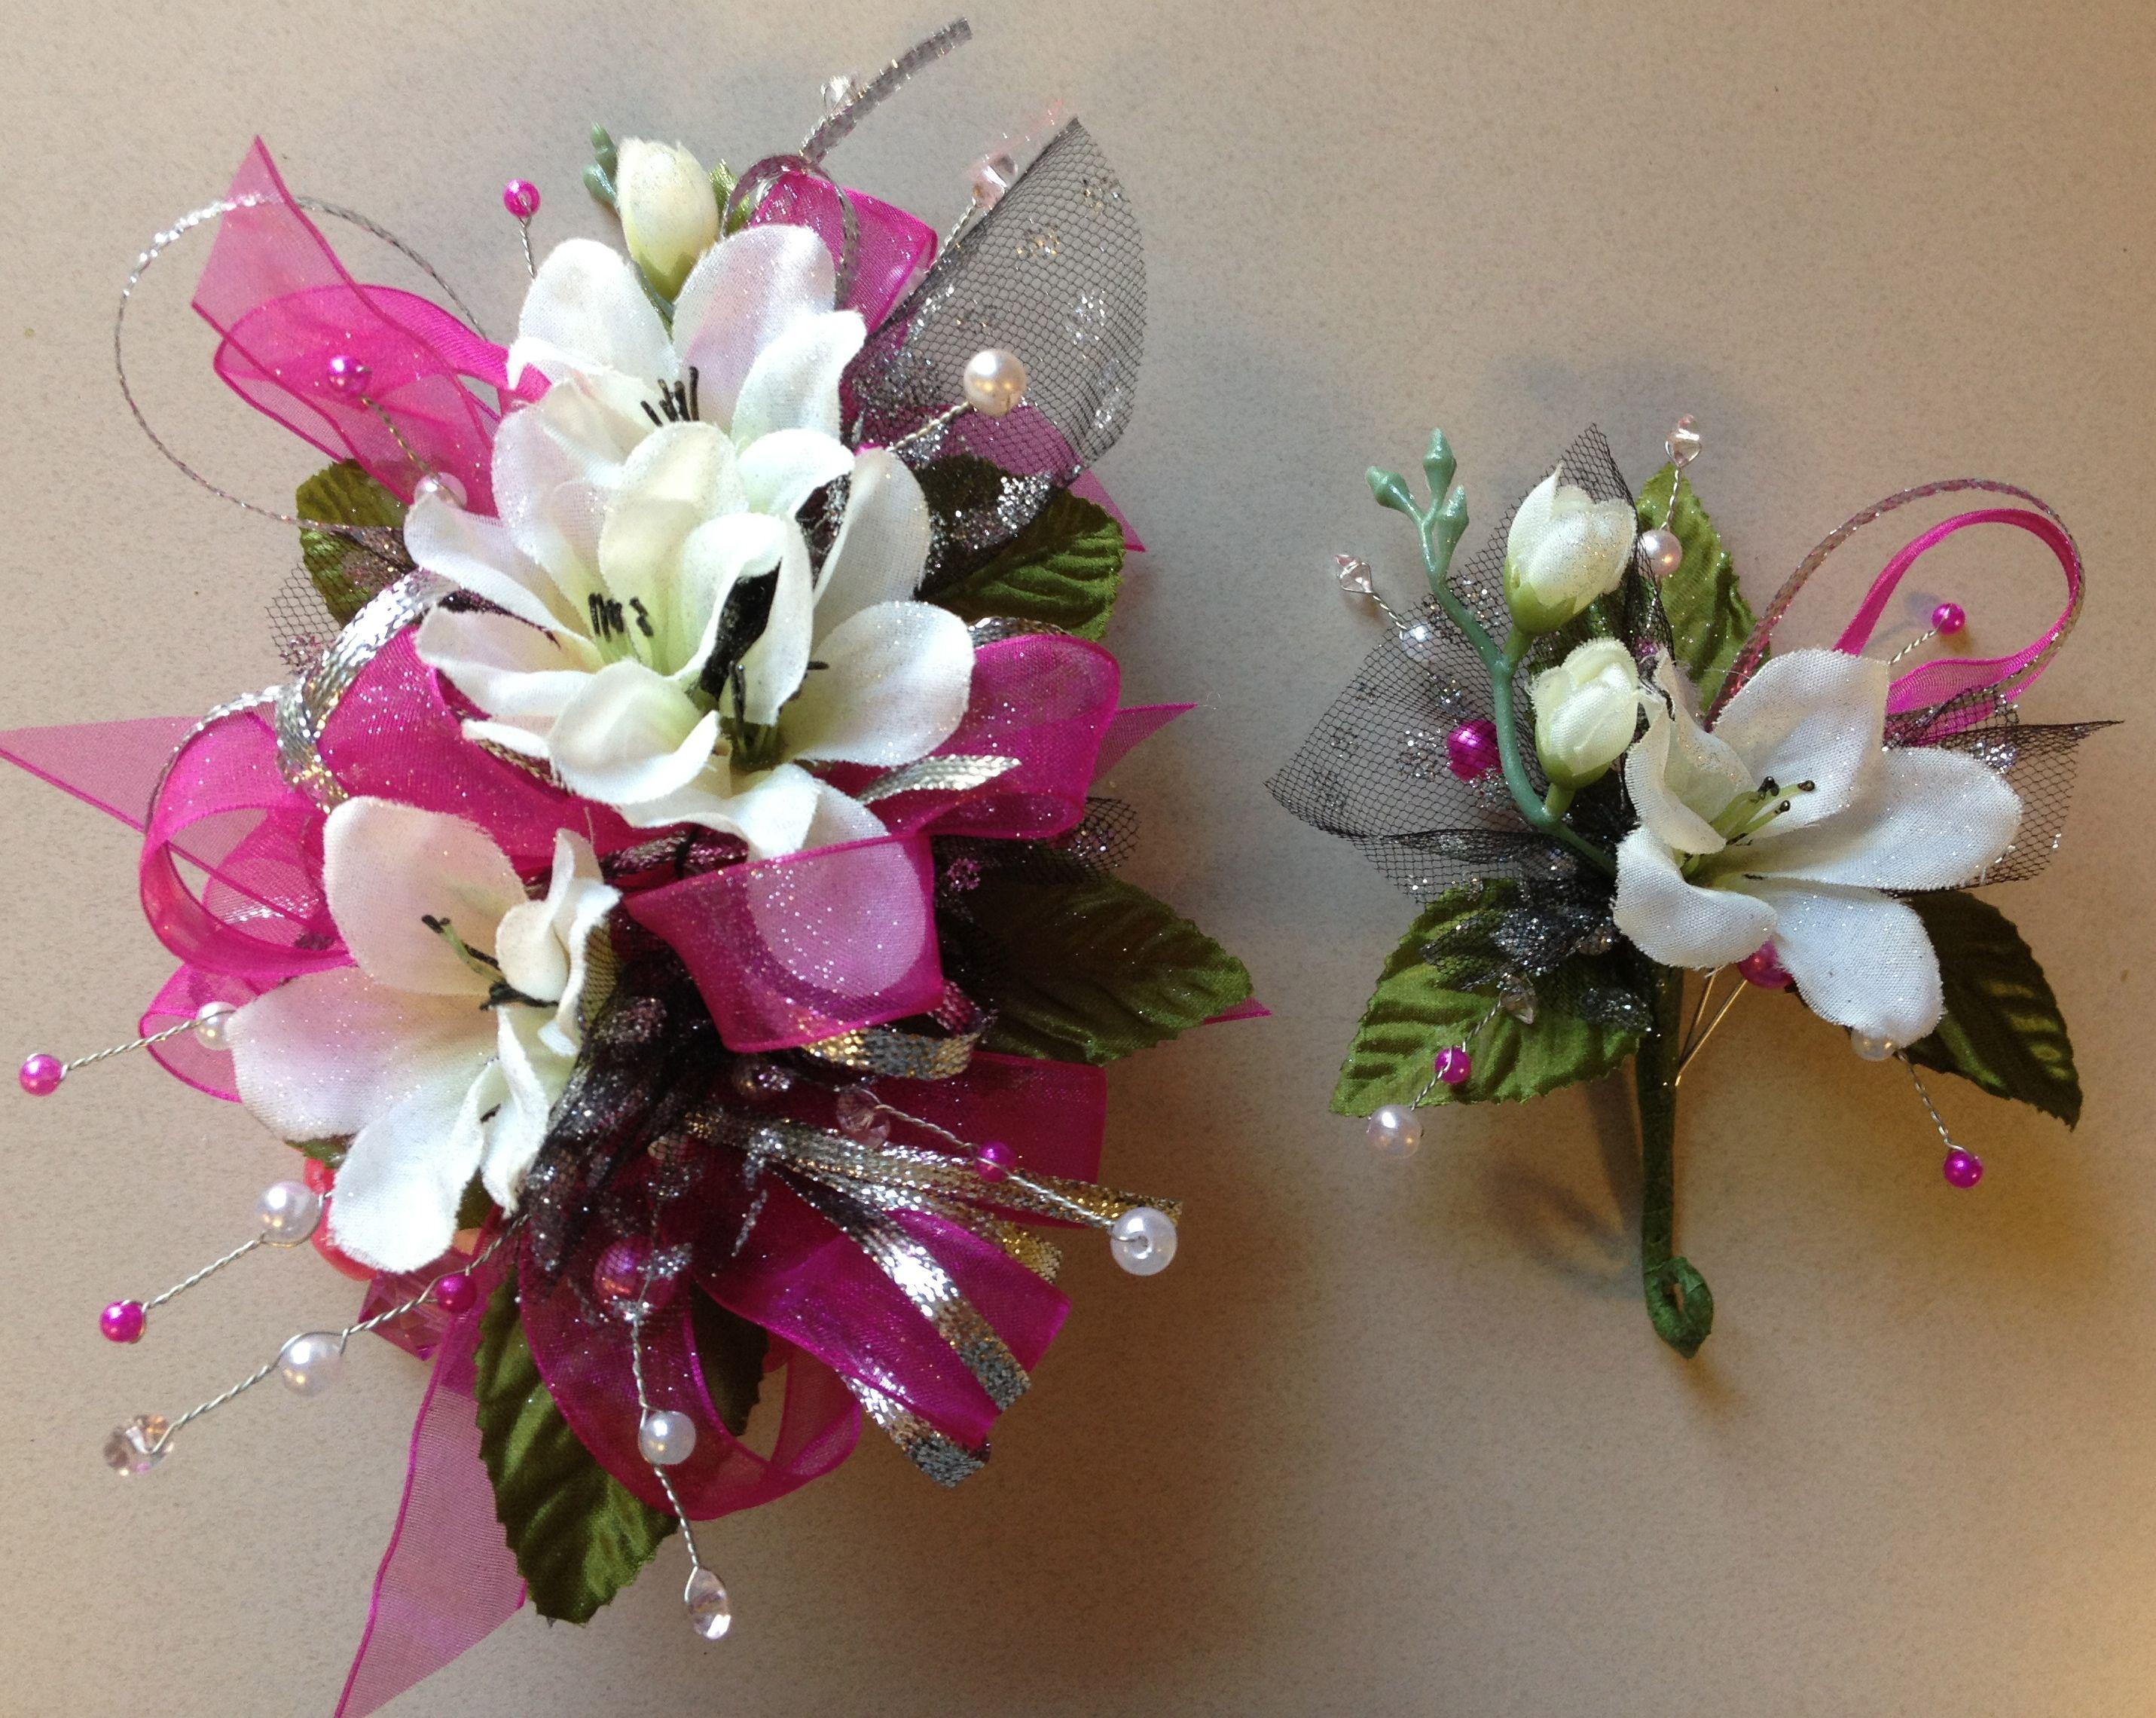 Silk fuchsia pink prom corsage letsdancegarters prom silk fuchsia pink prom corsage letsdancegarters dhlflorist Gallery